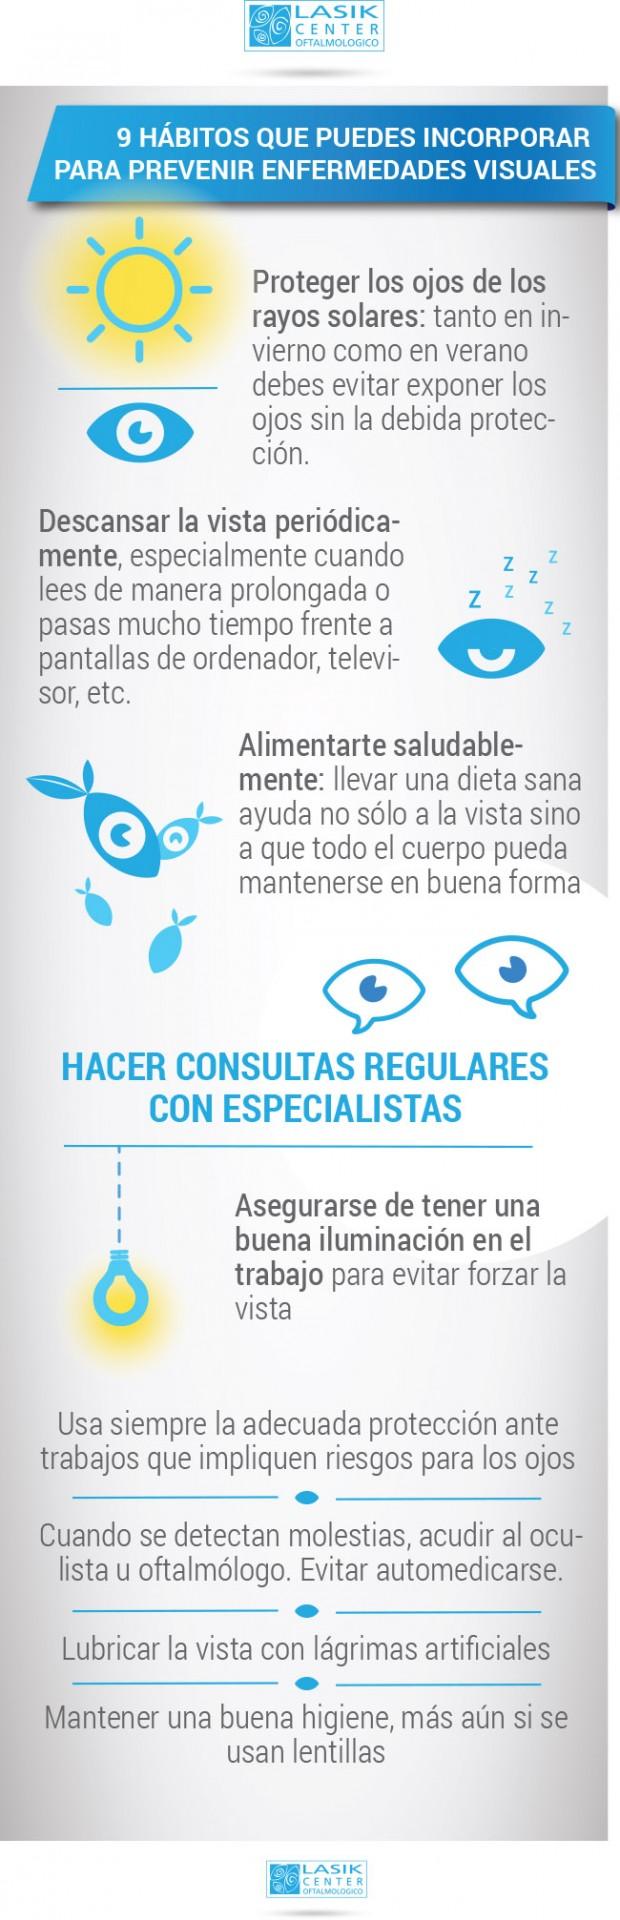 9 hábitos que ayudan a prevenir enfermedades visuales